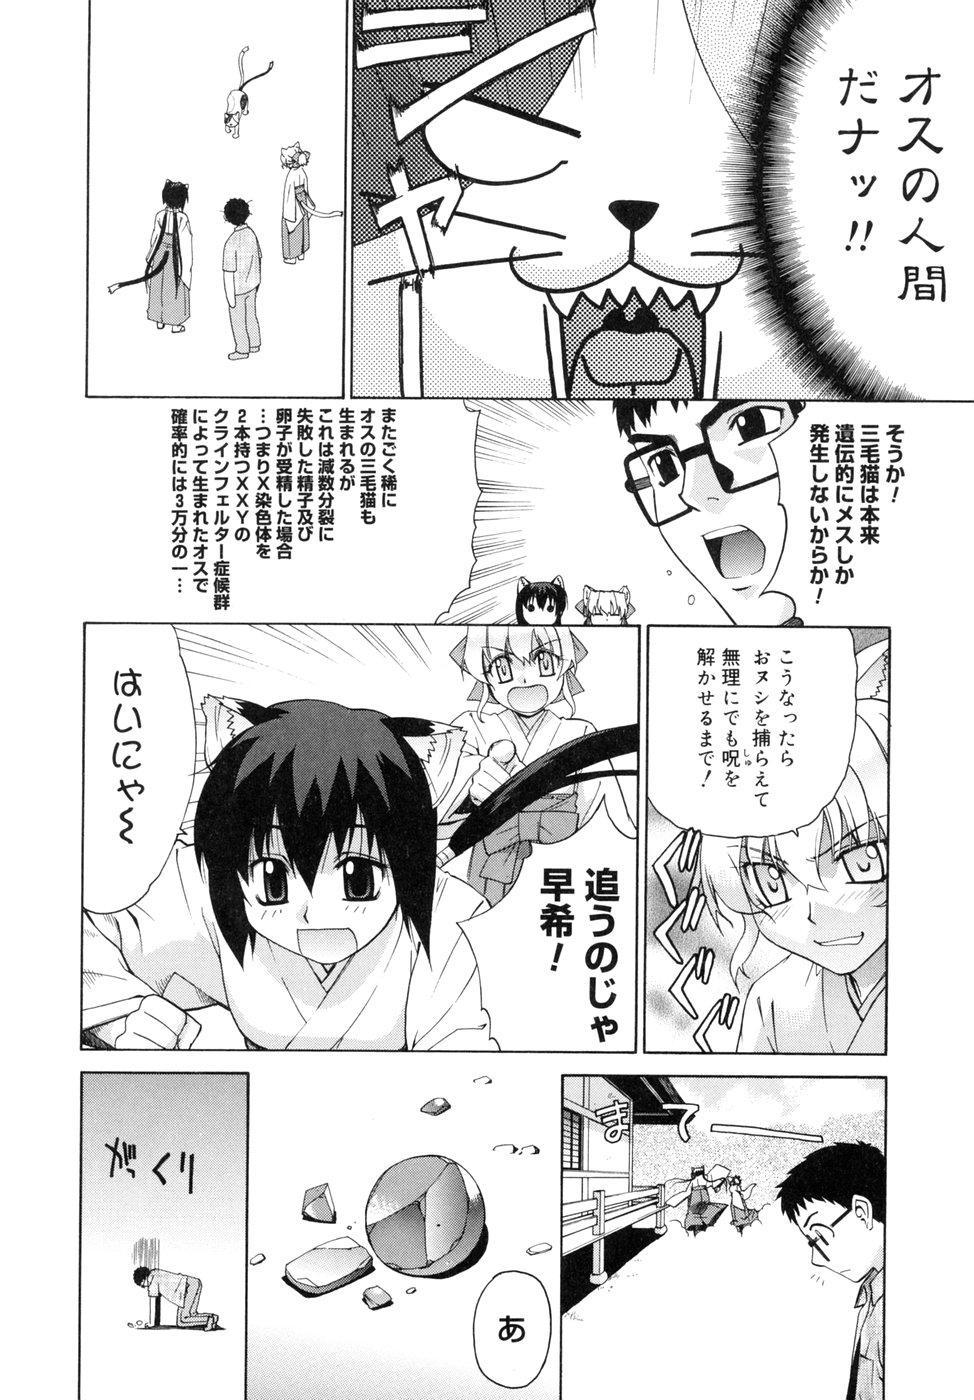 [Yaya Hinata] Tonari no Miko-san wa Minna Warau - The next shrine maidens smile in everyone. 157